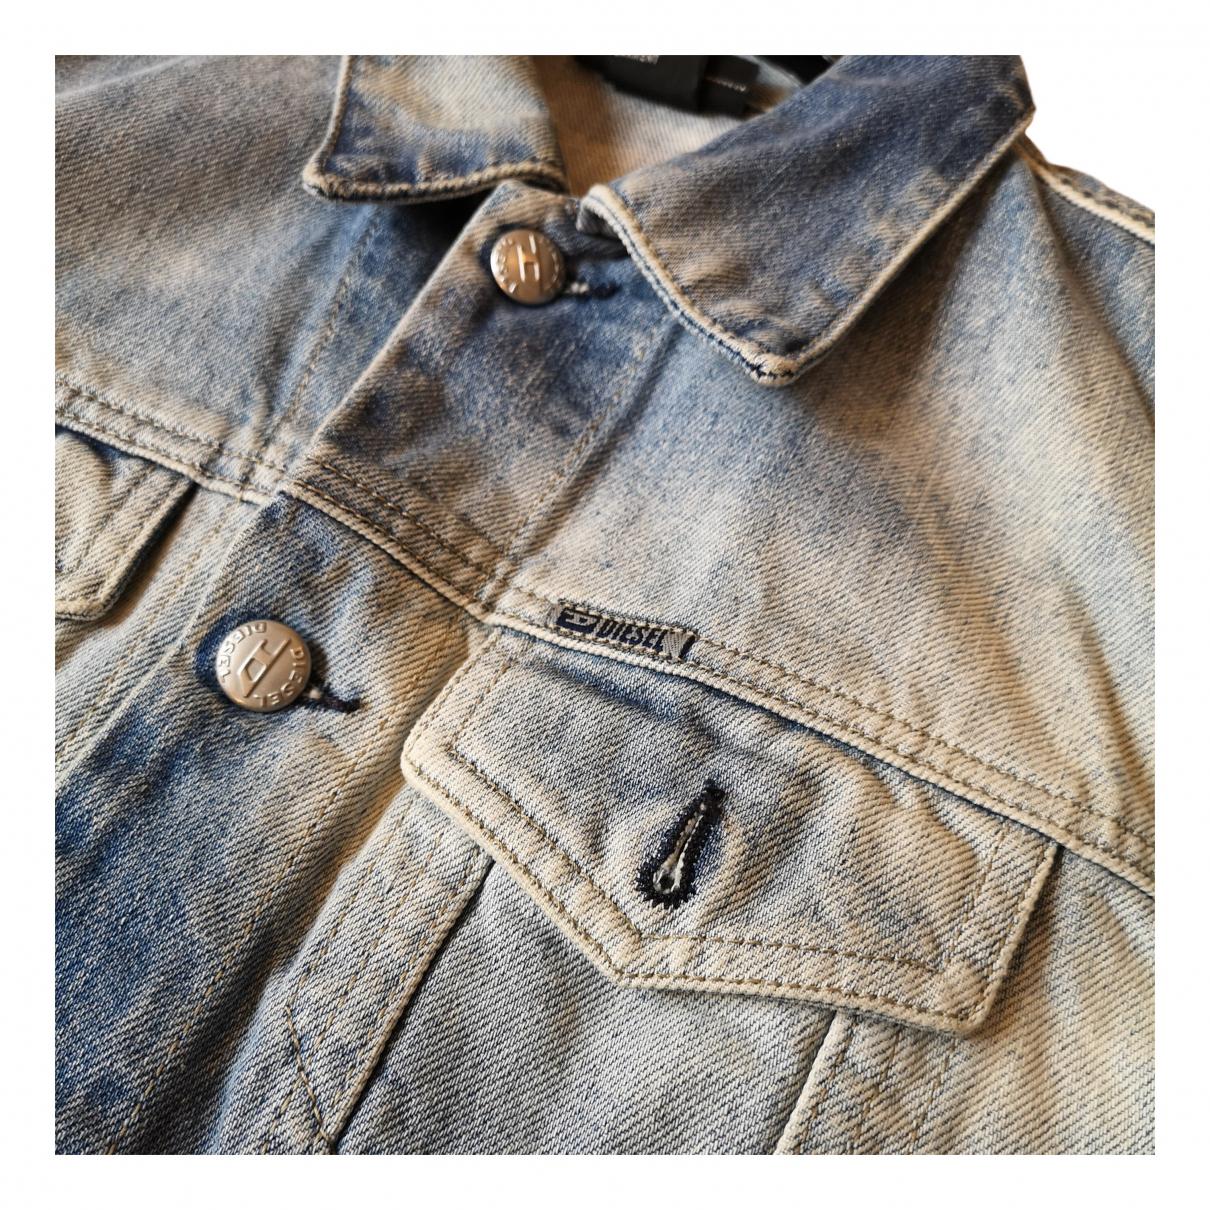 Diesel N Multicolour Denim - Jeans jacket for Women M International